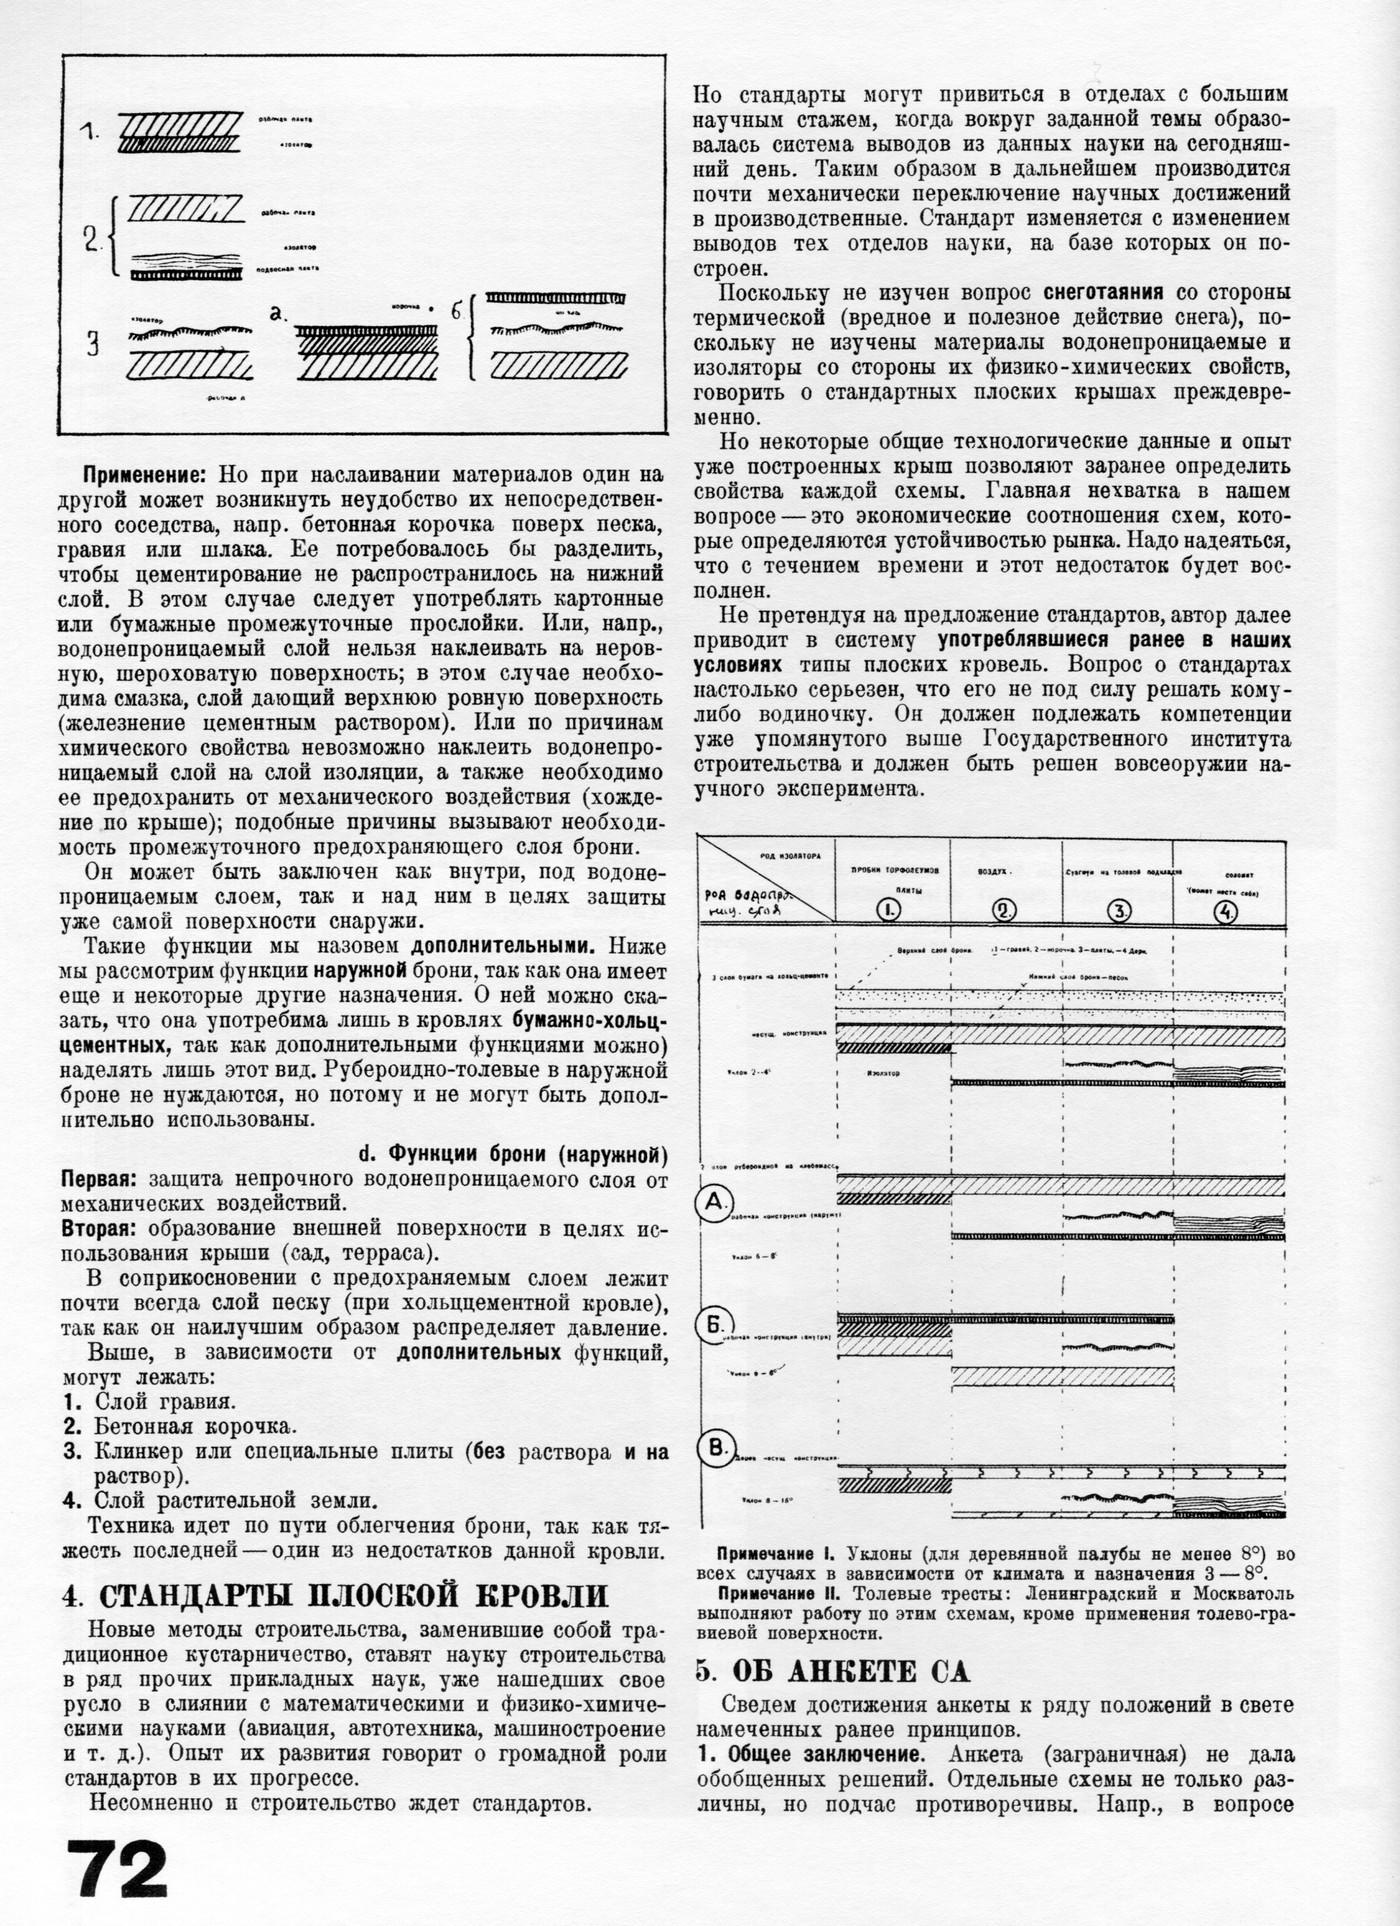 tehne.com-sa-1927-2-1400-028